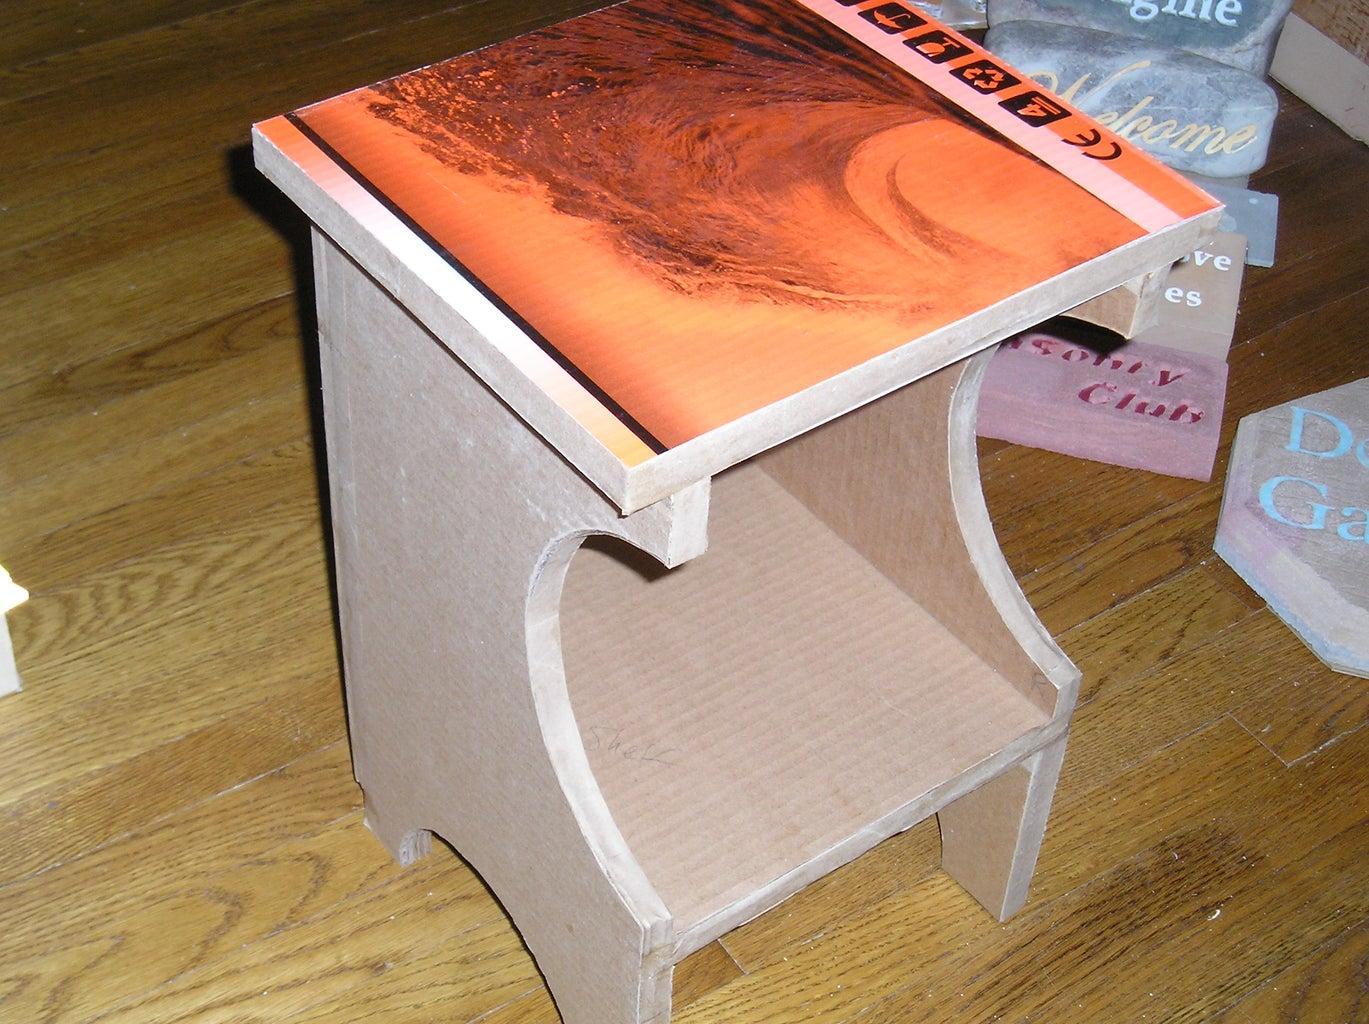 Finish Edges of Exposed Cardboard.